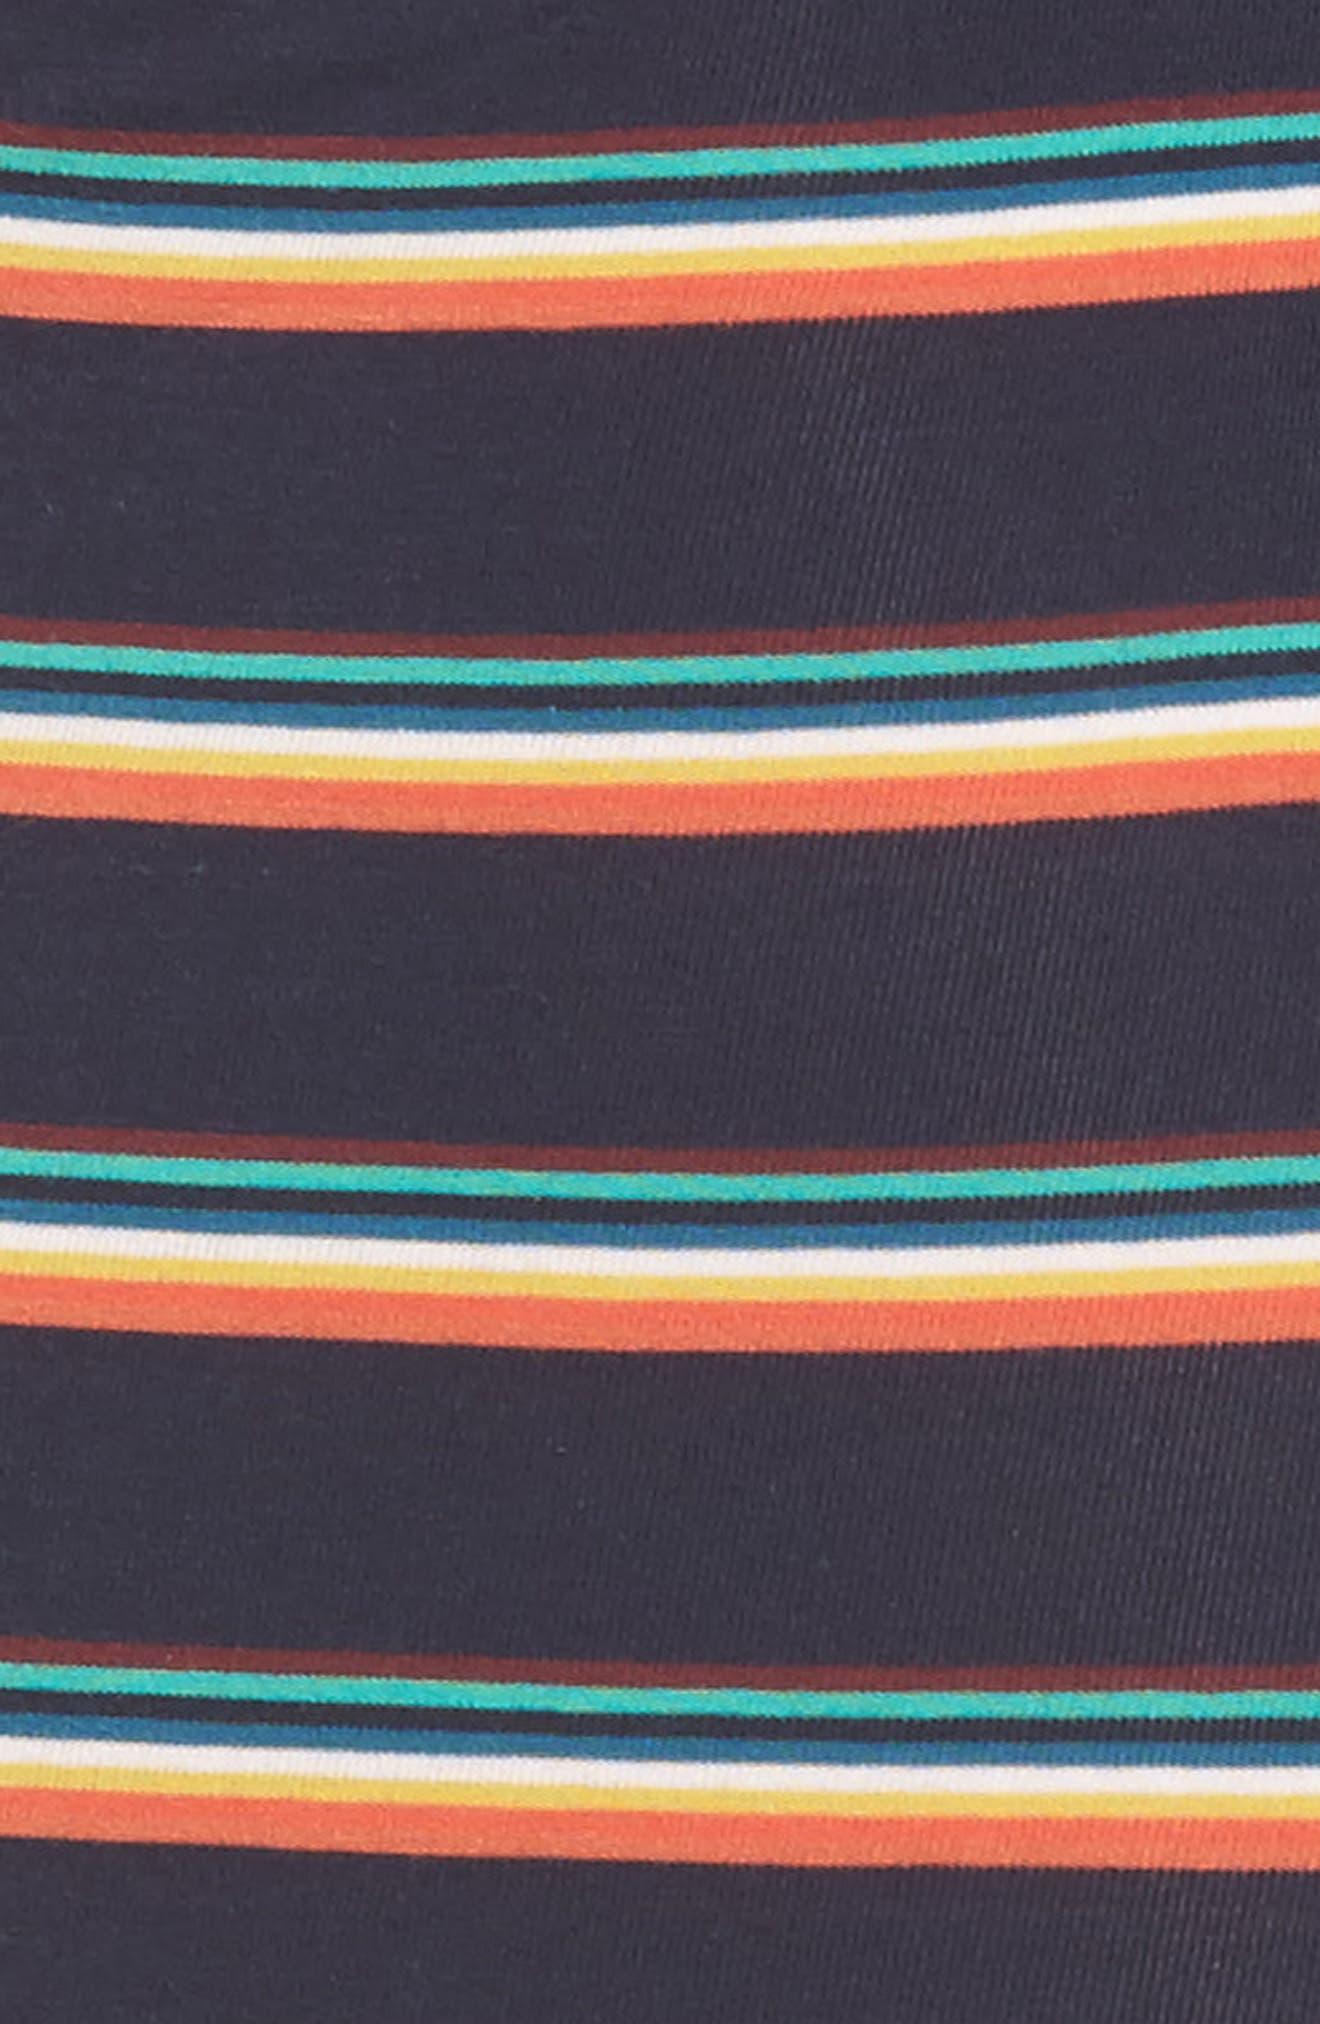 Stripe Stretch Cotton Trunks,                             Alternate thumbnail 4, color,                             847